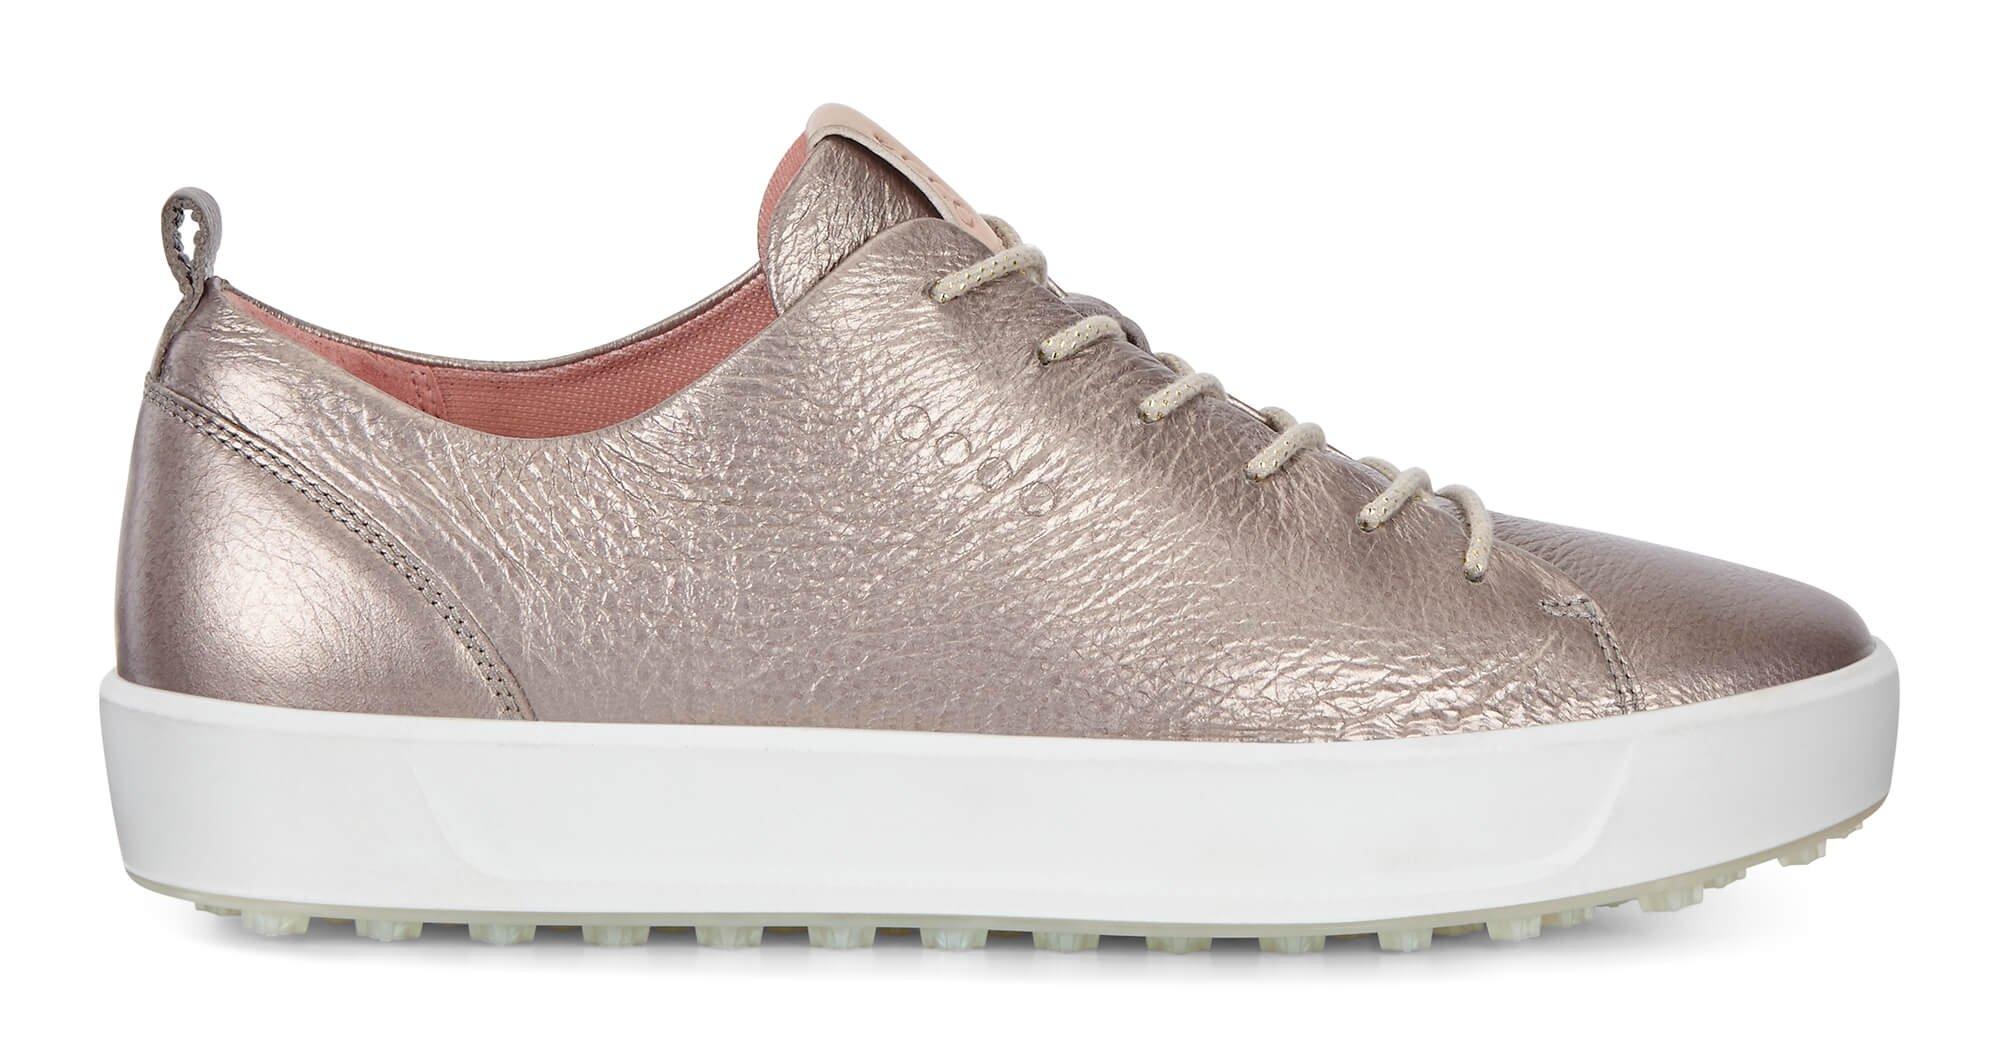 ecco ladies golf shoes